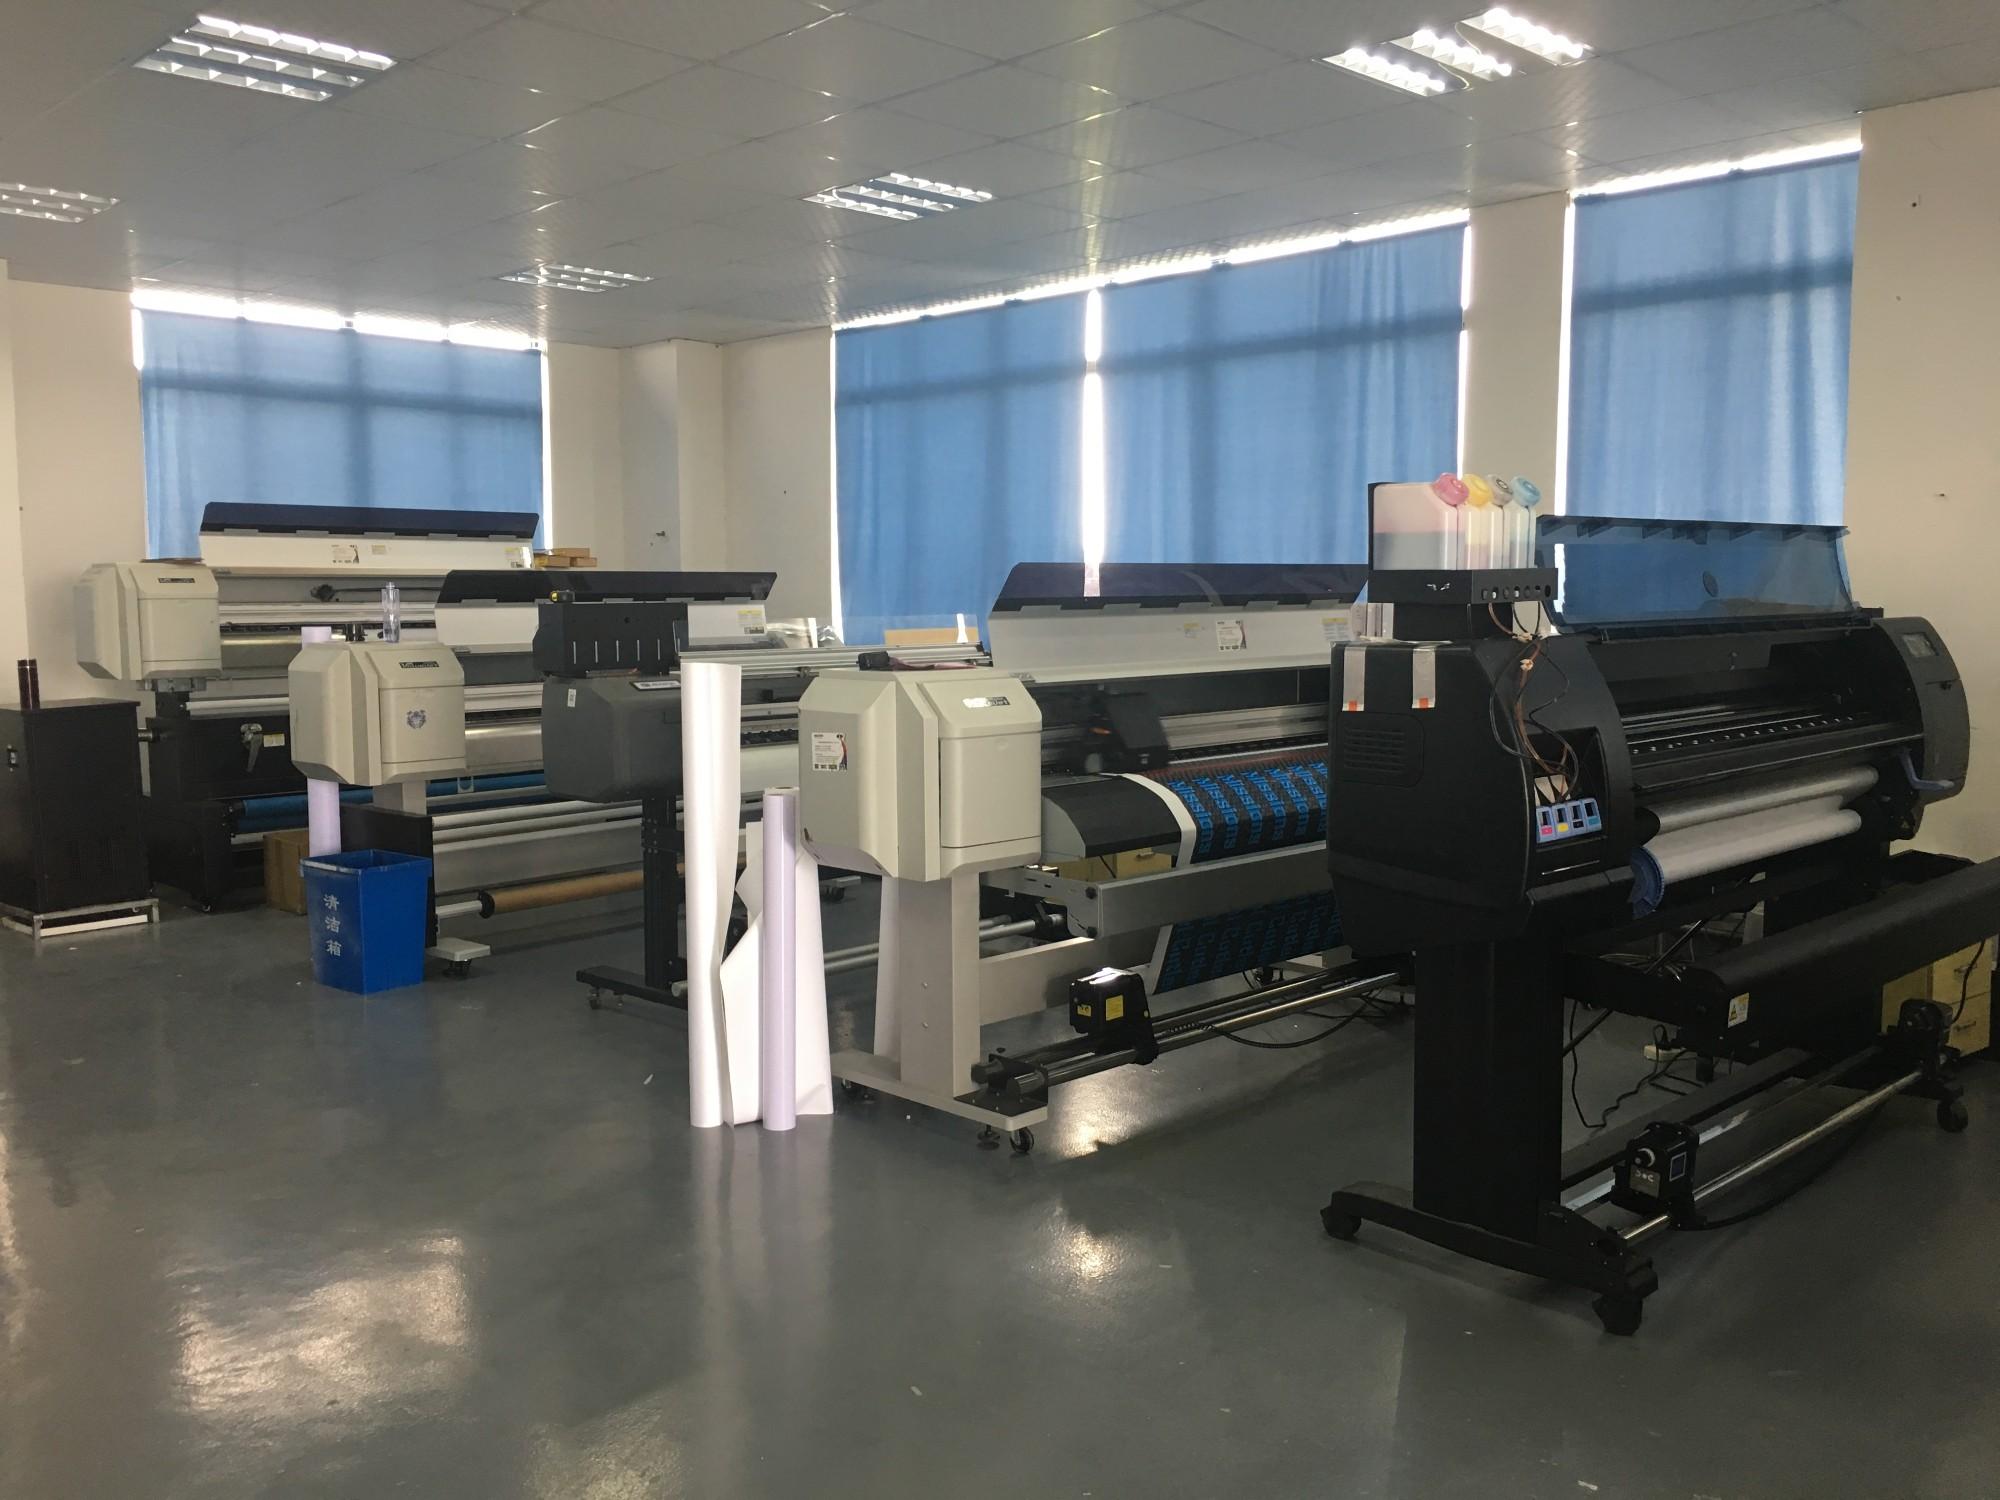 Dust-Free Workshop for digital printing